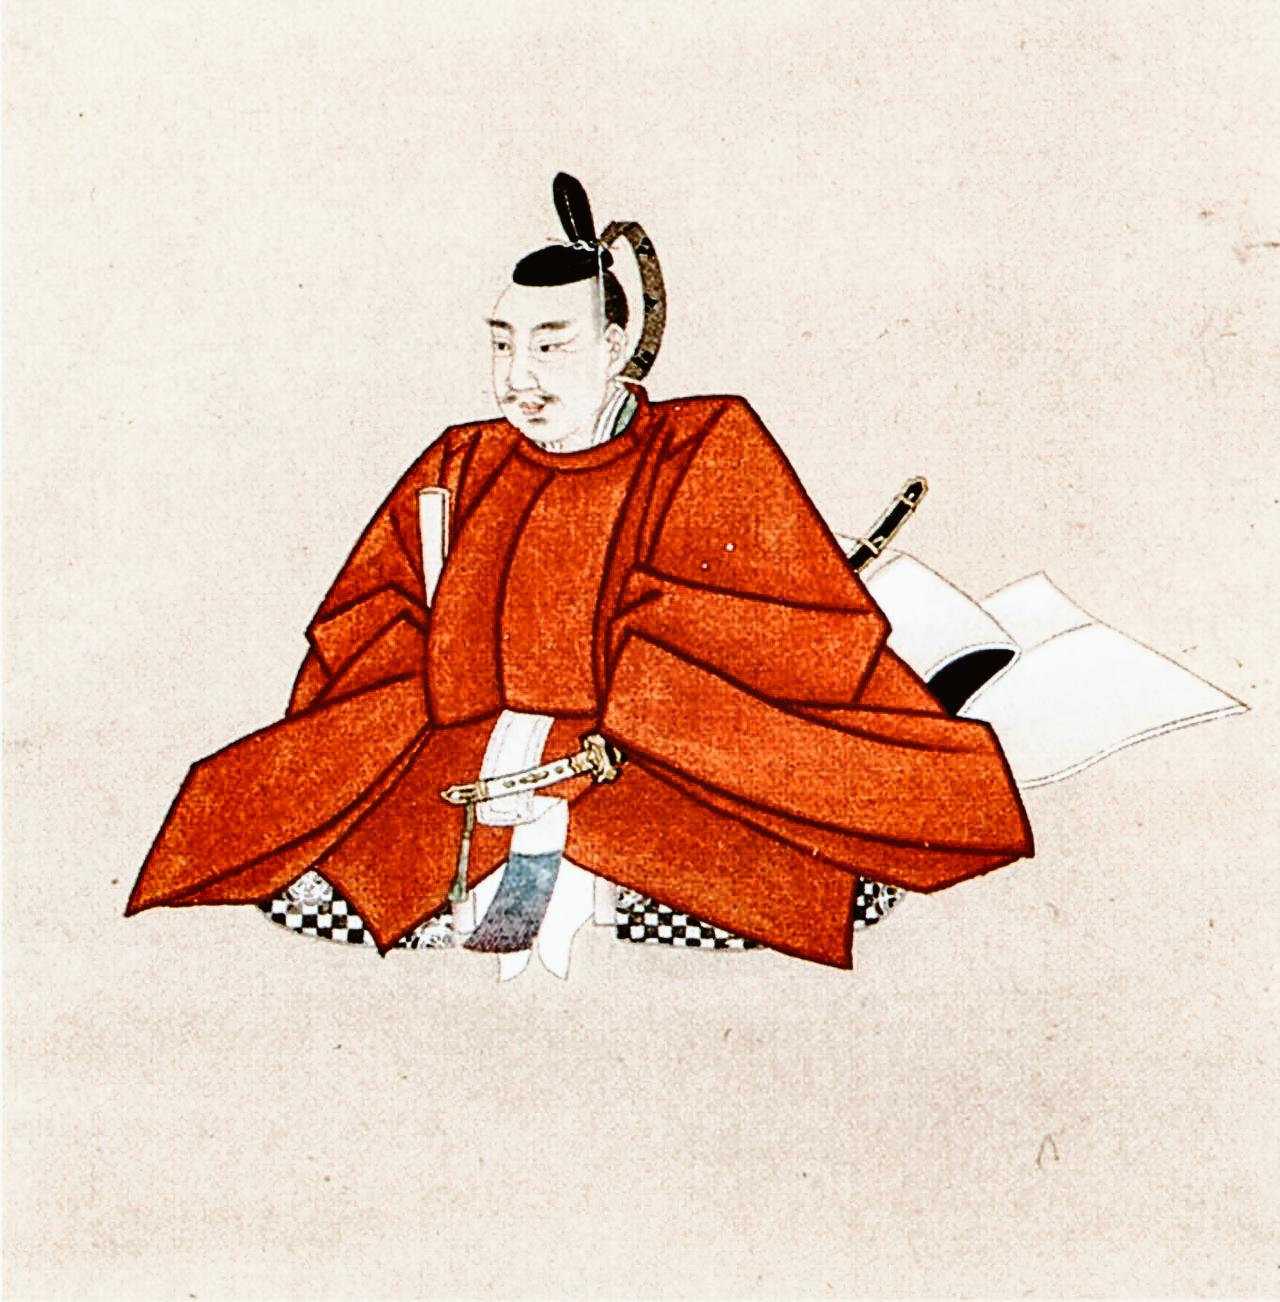 Furuta Shigenari